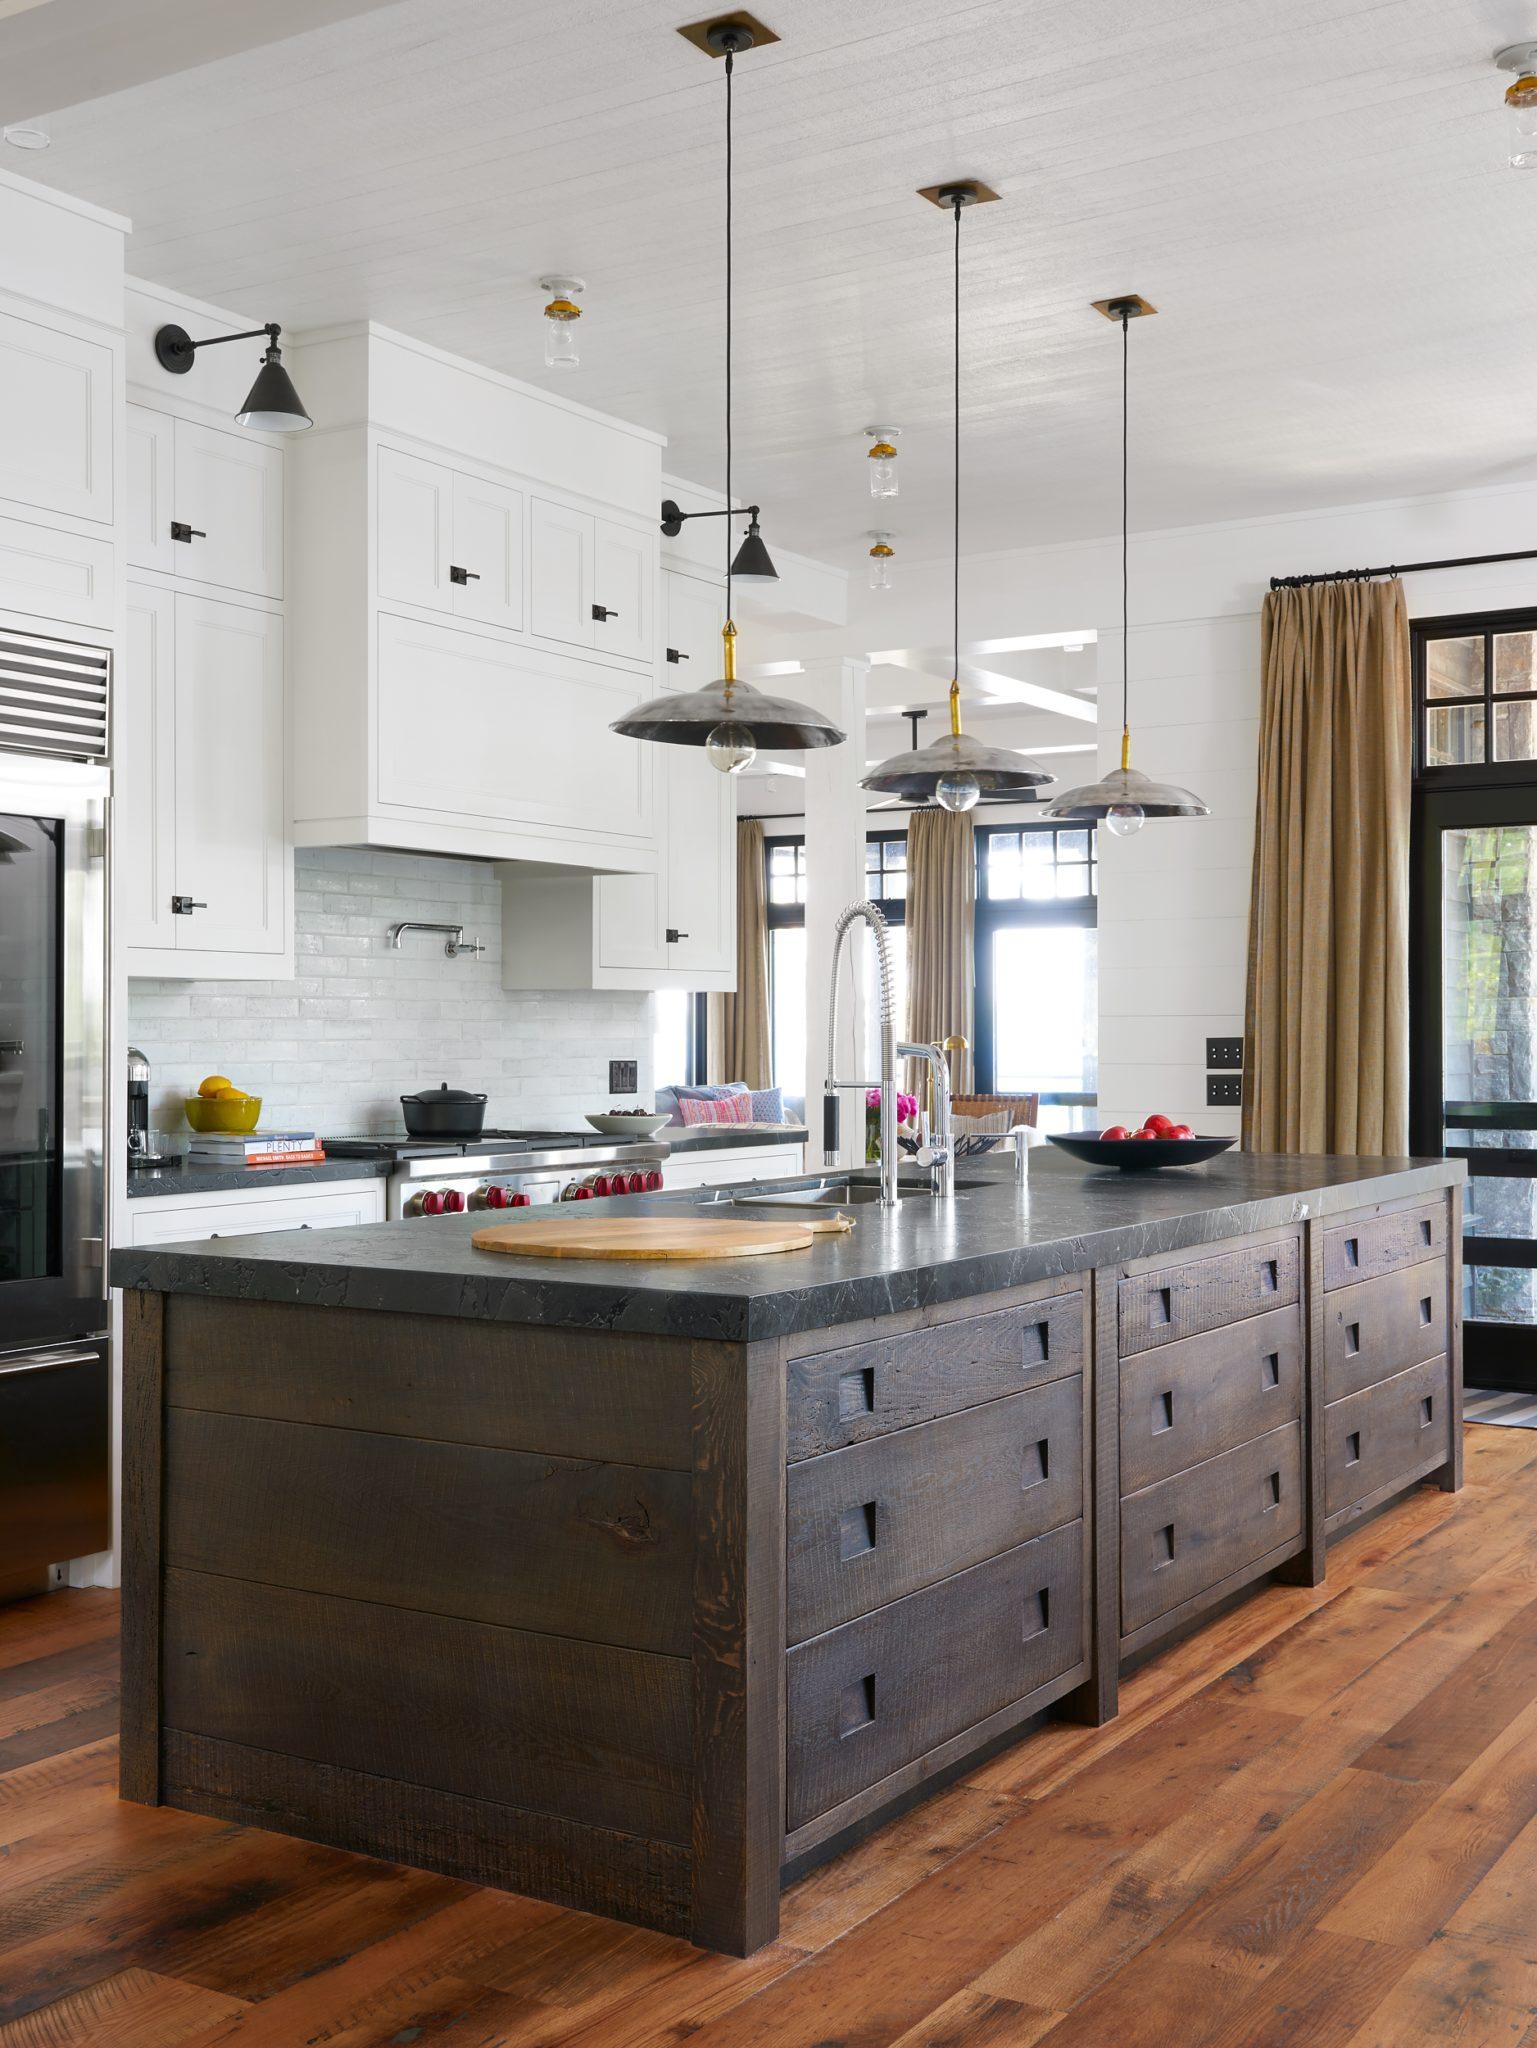 Muskoka cottage - kitchen by Jennifer Worts Design